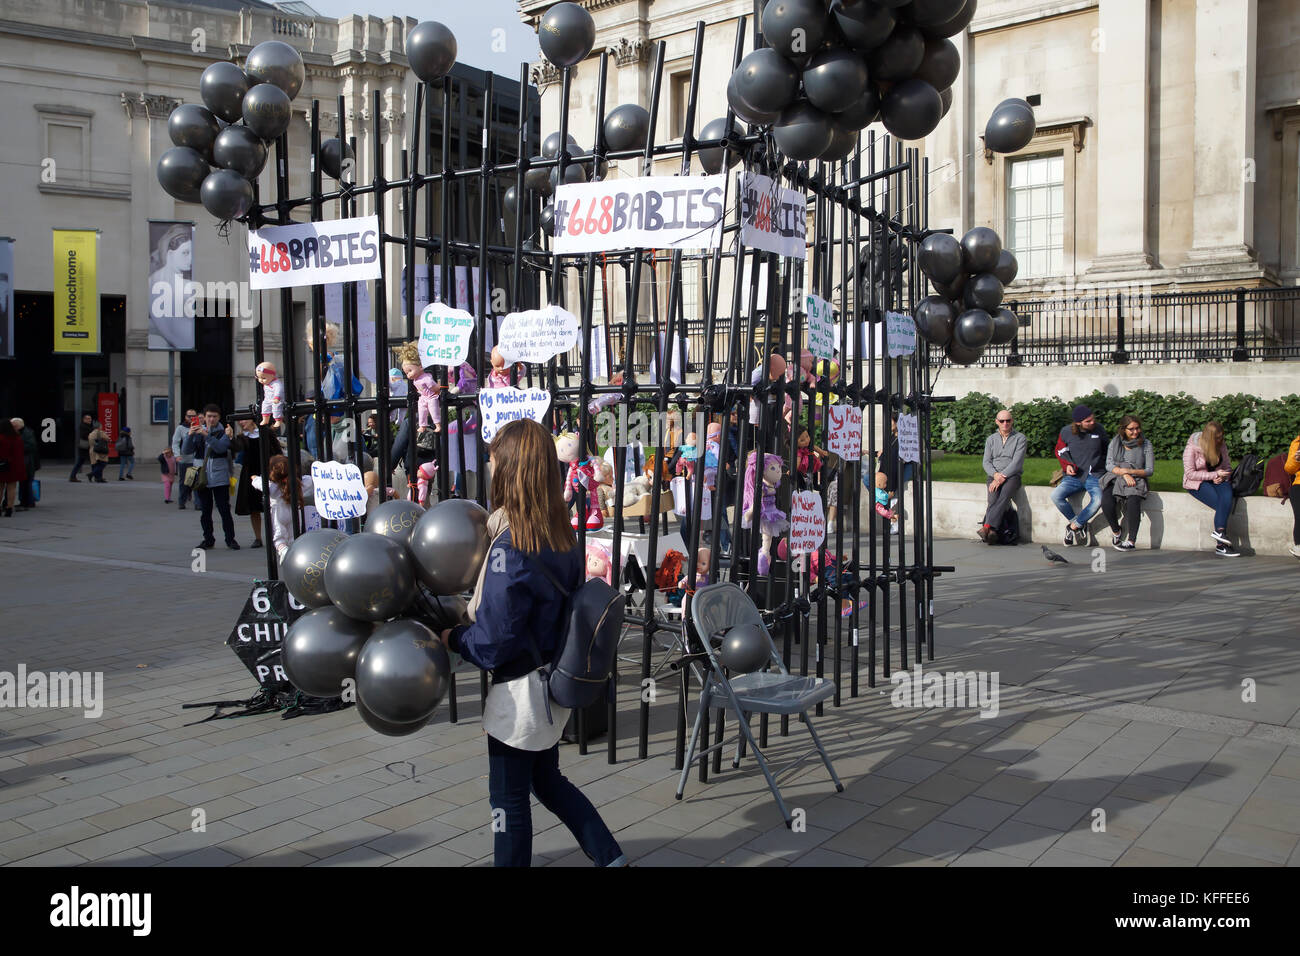 London,UK,28th October 2017,Turkey Purge Demonstration in Trafalgar Square London©Keith Larby/Alamy live News - Stock Image